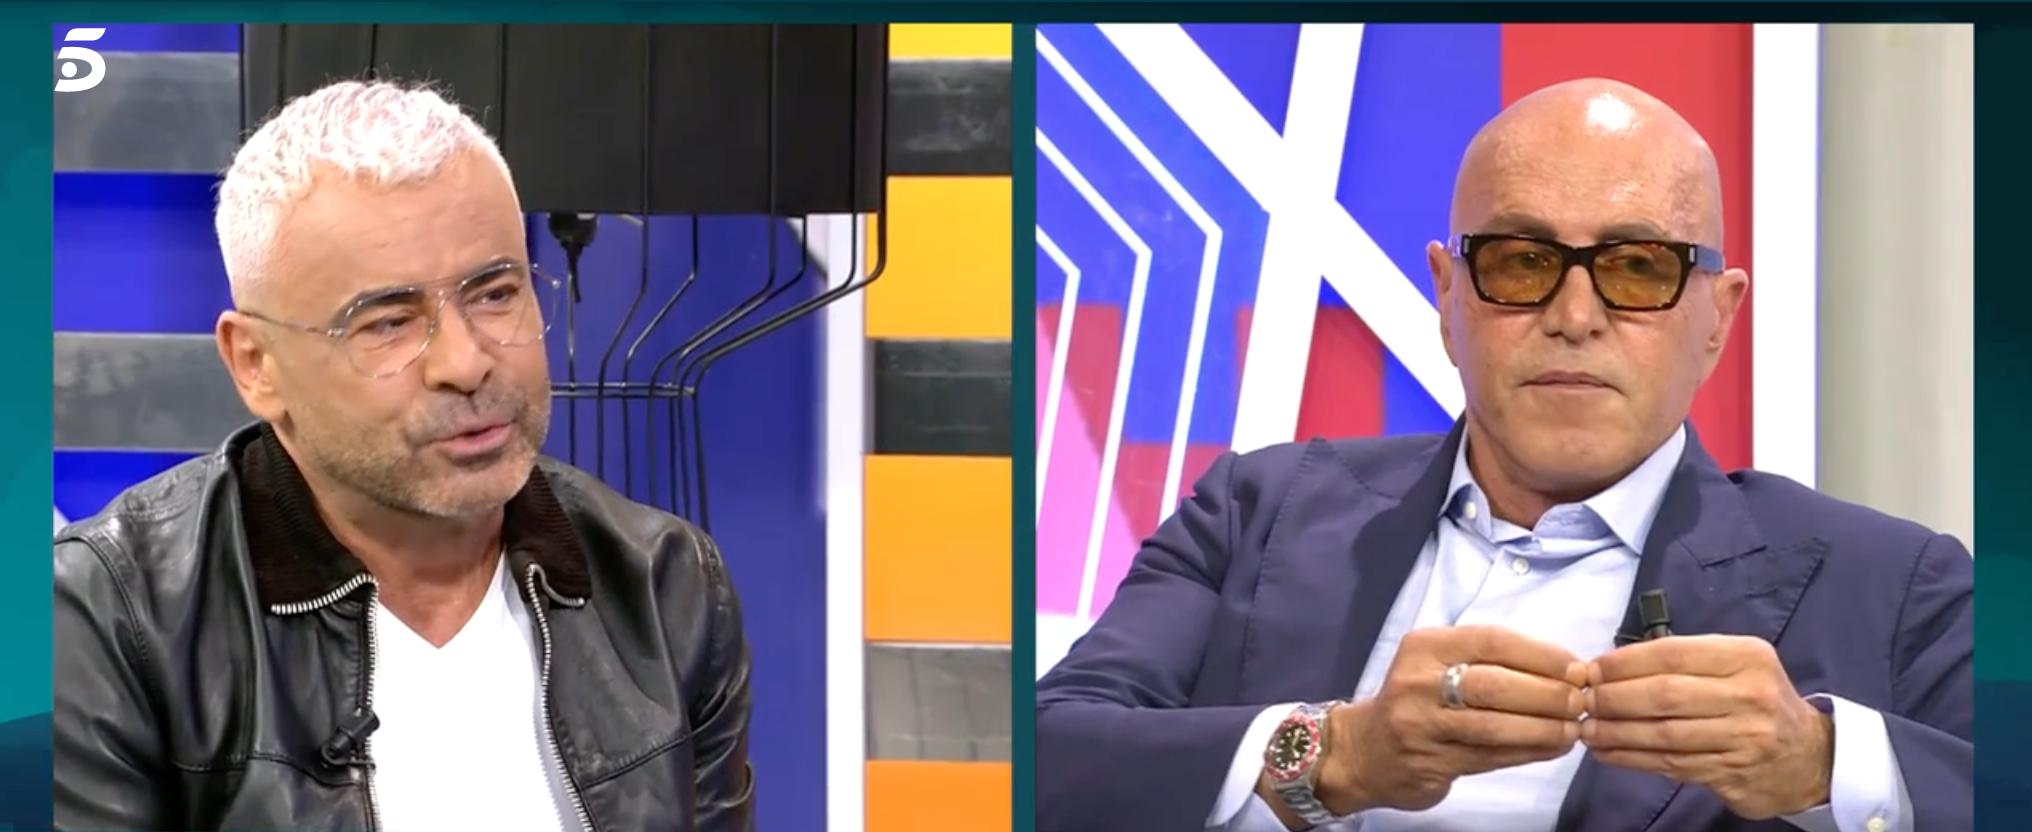 Jorge Javier Vázquez i Kiko Matamoros   Telecinco